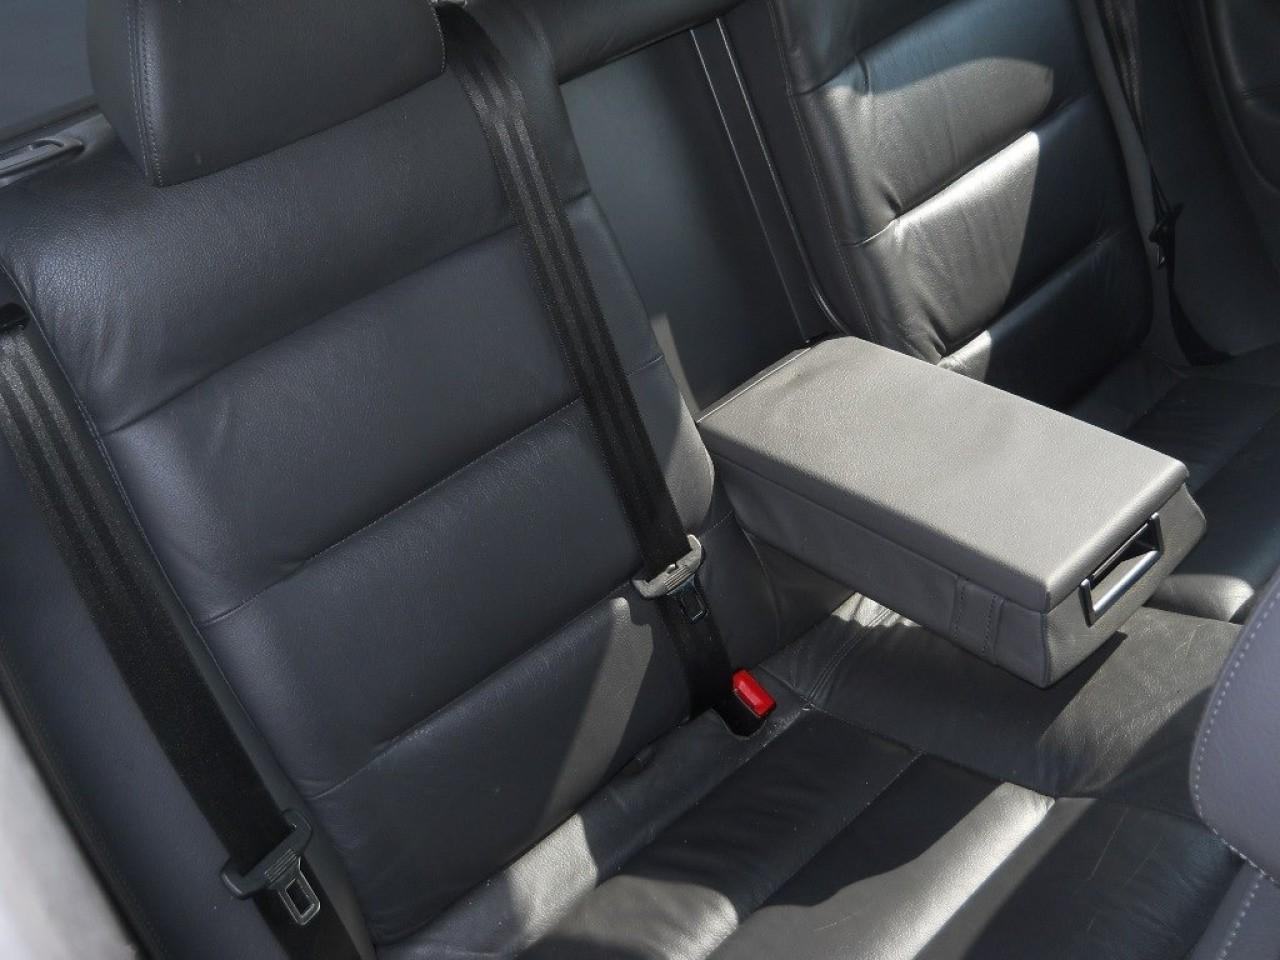 Dezmembrez Vw Passat B6 Combi 1 9 Tdi Avf Automat Din 2005